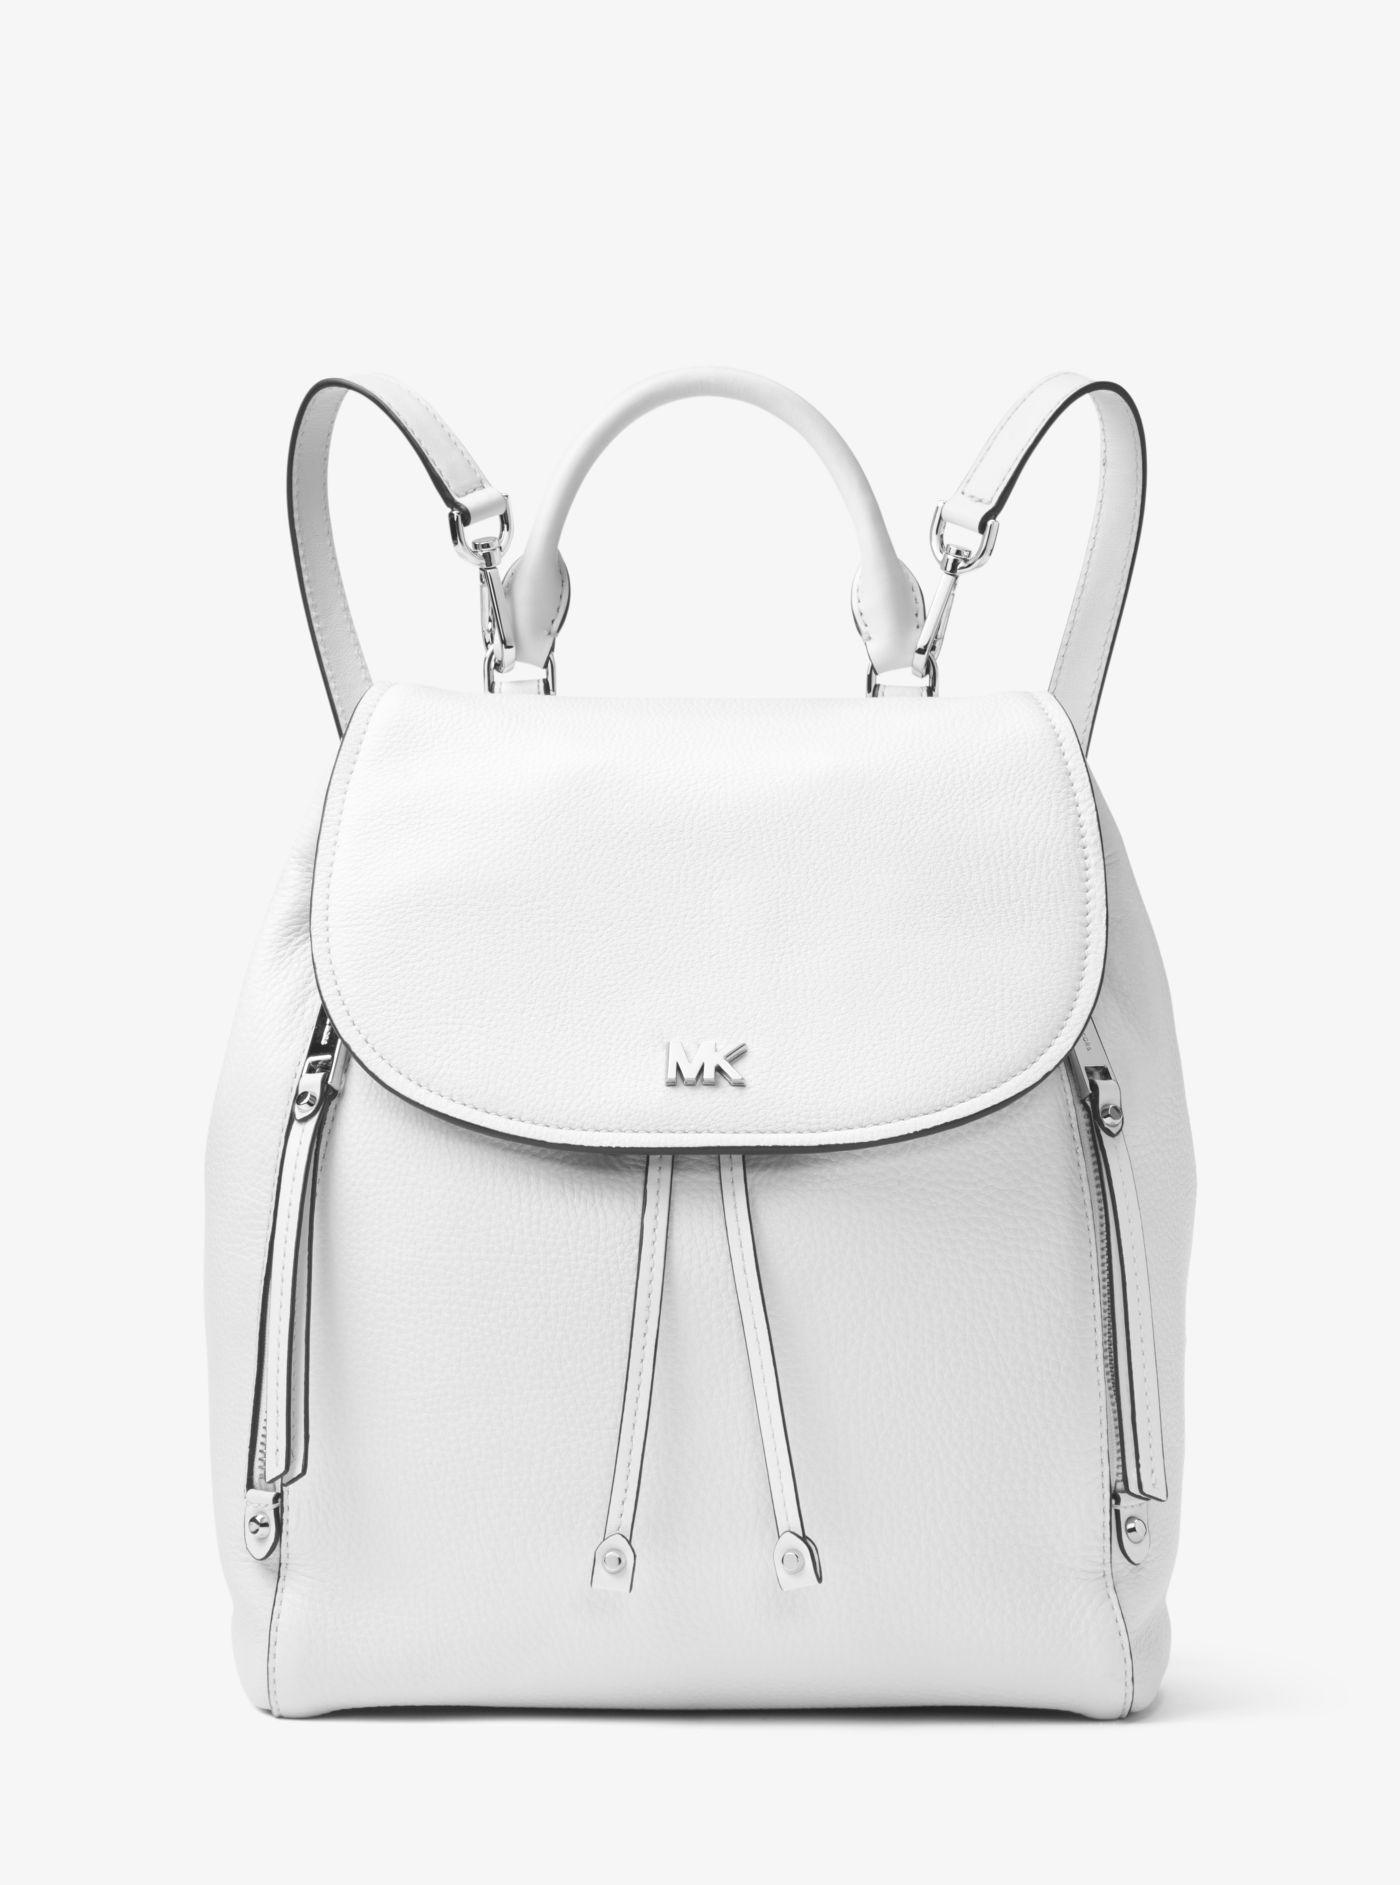 48fc7b0344189 ... new zealand michael kors evie medium leather backpack in white lyst  cf8f8 d7e06